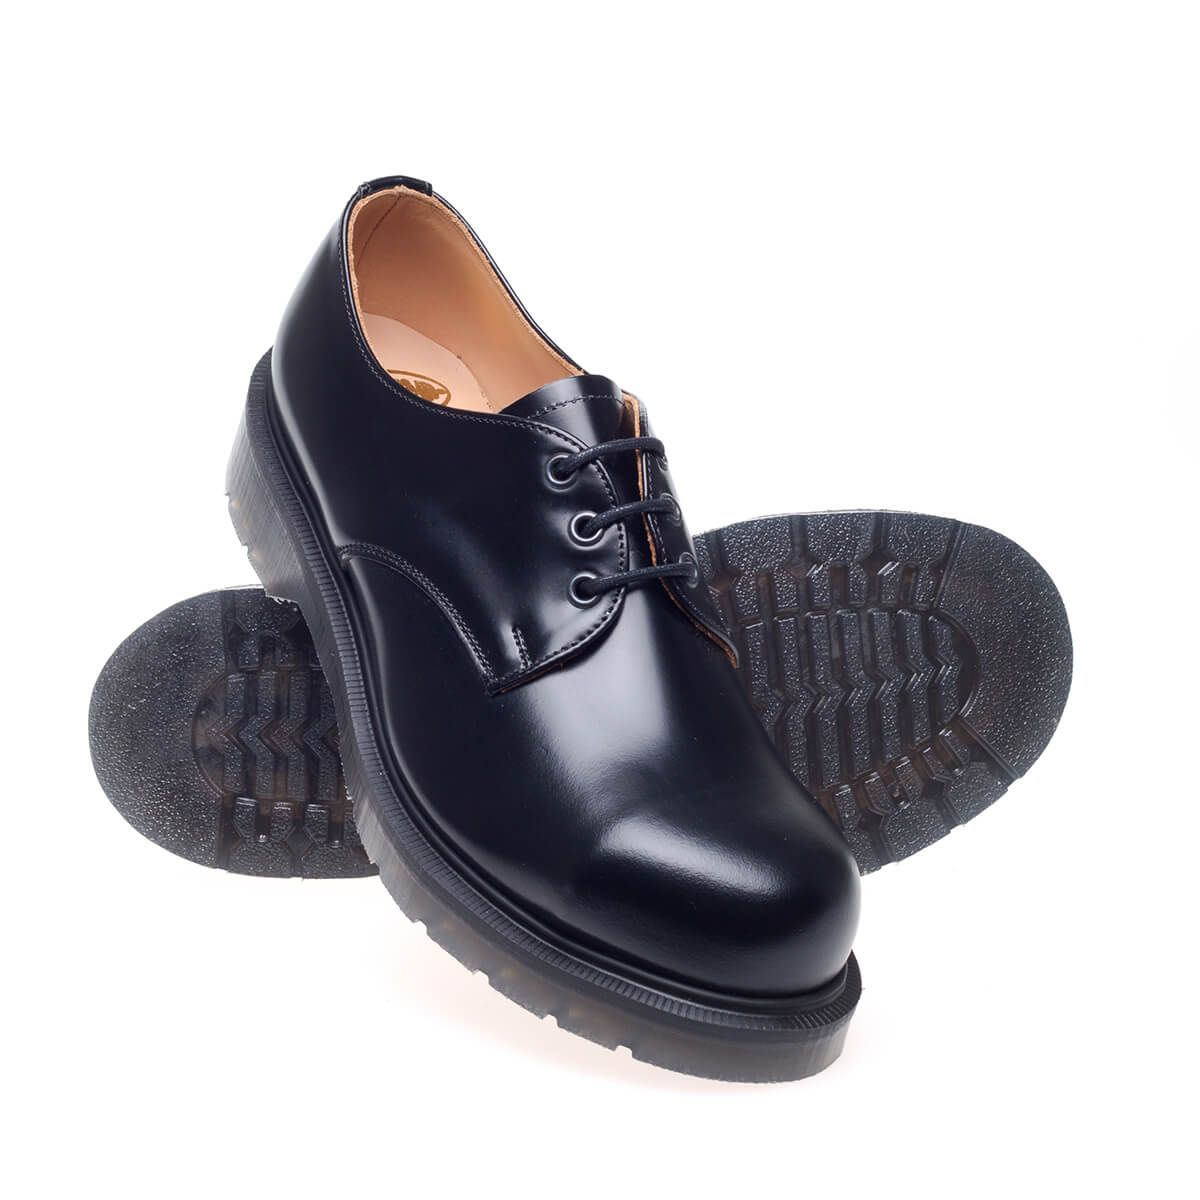 Highlander' Steel Toe Cap Gibson Shoe